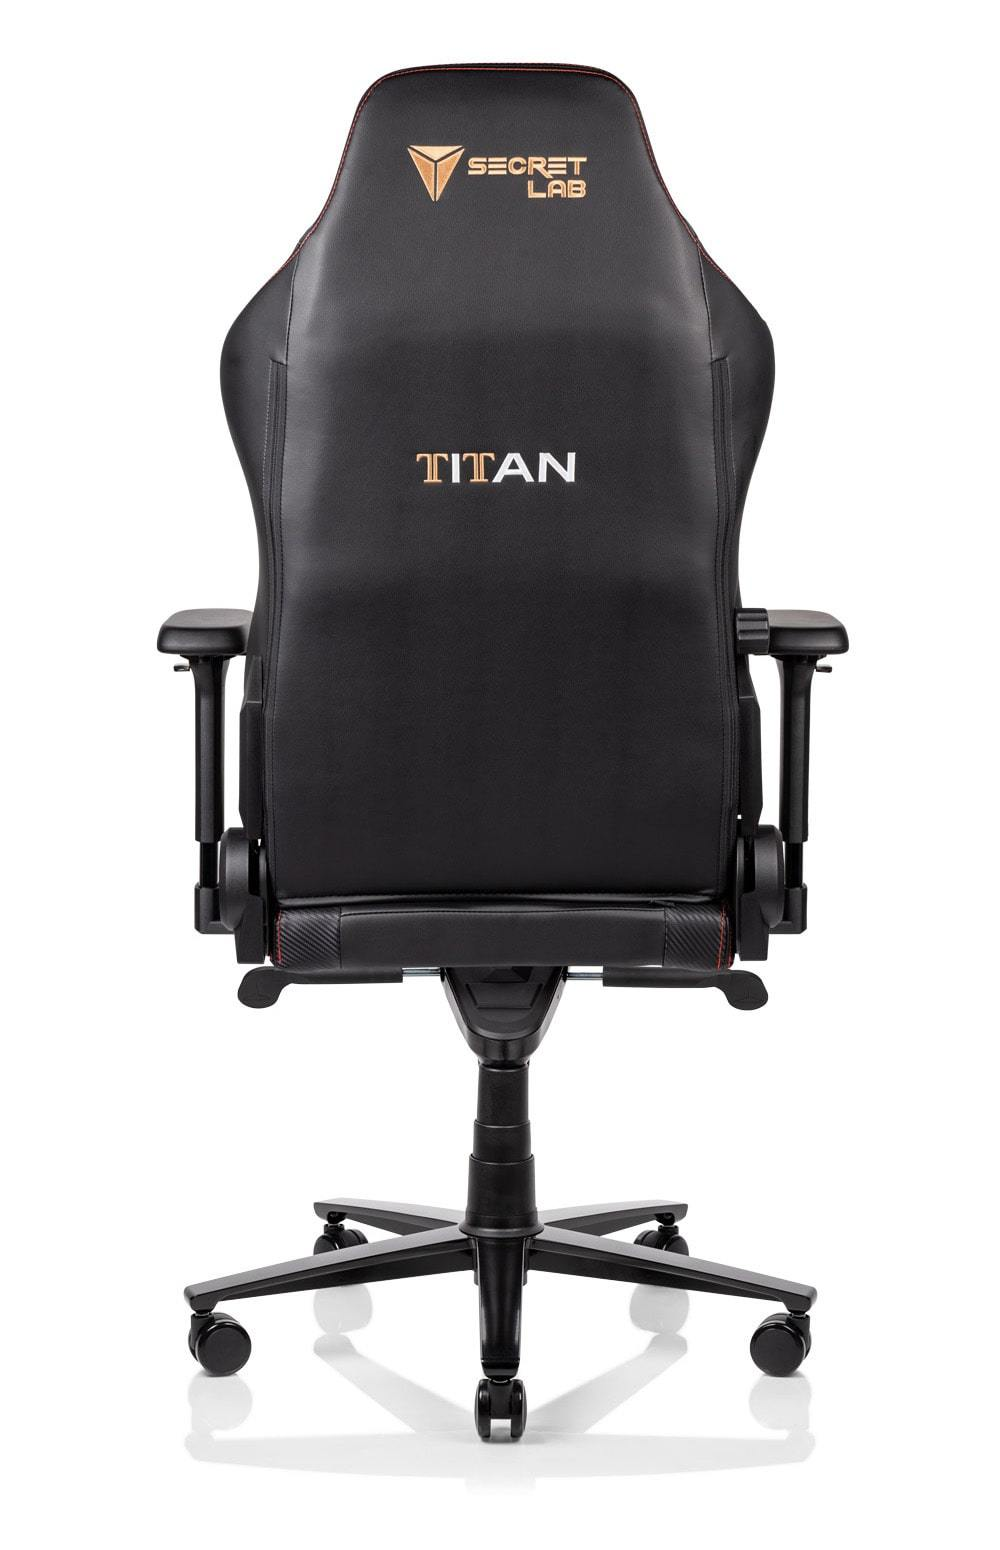 Secretlab Titan - Best Gaming Chair